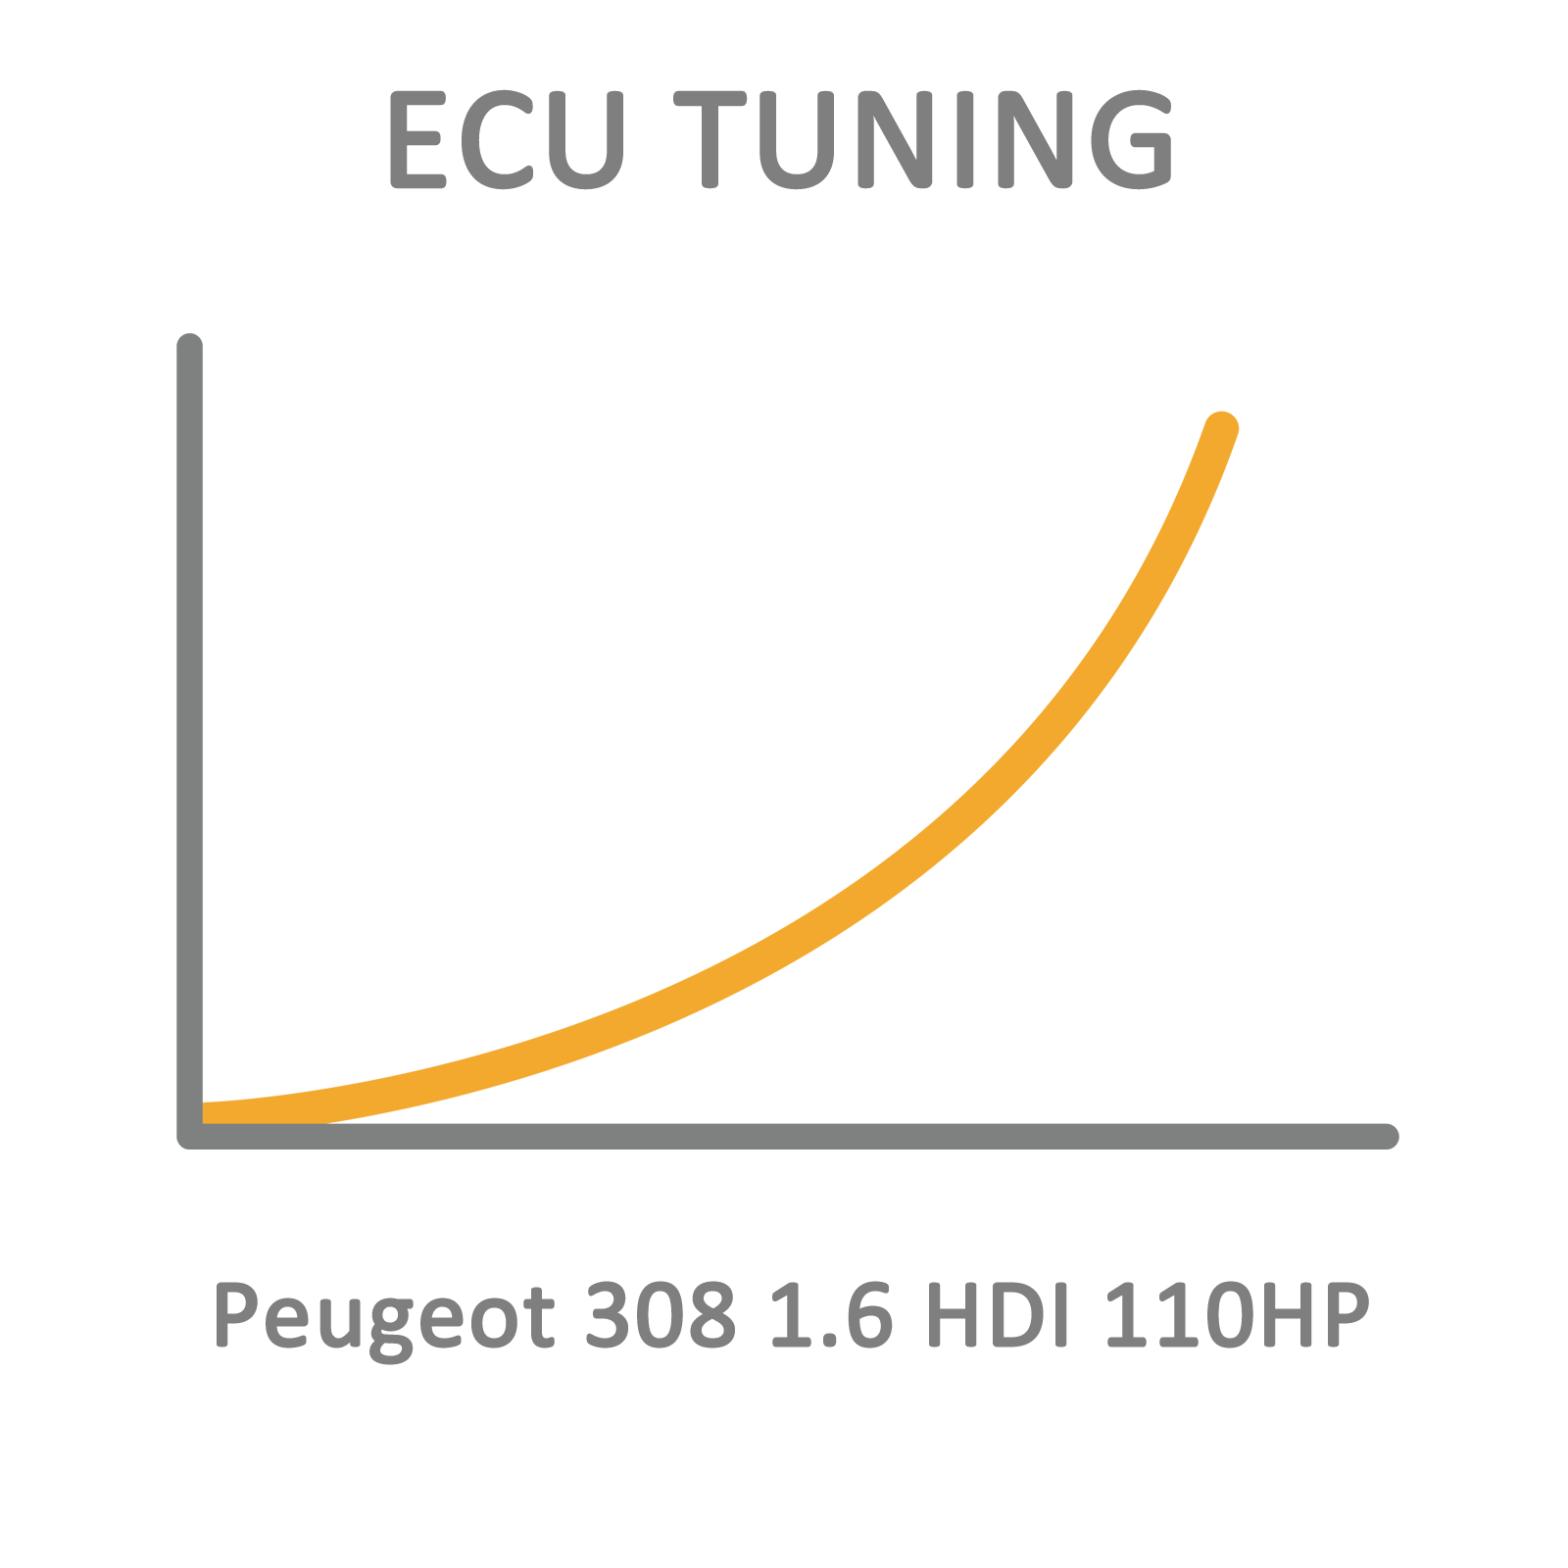 Peugeot 308 1.6 HDI 110HP ECU Tuning Remapping Programming